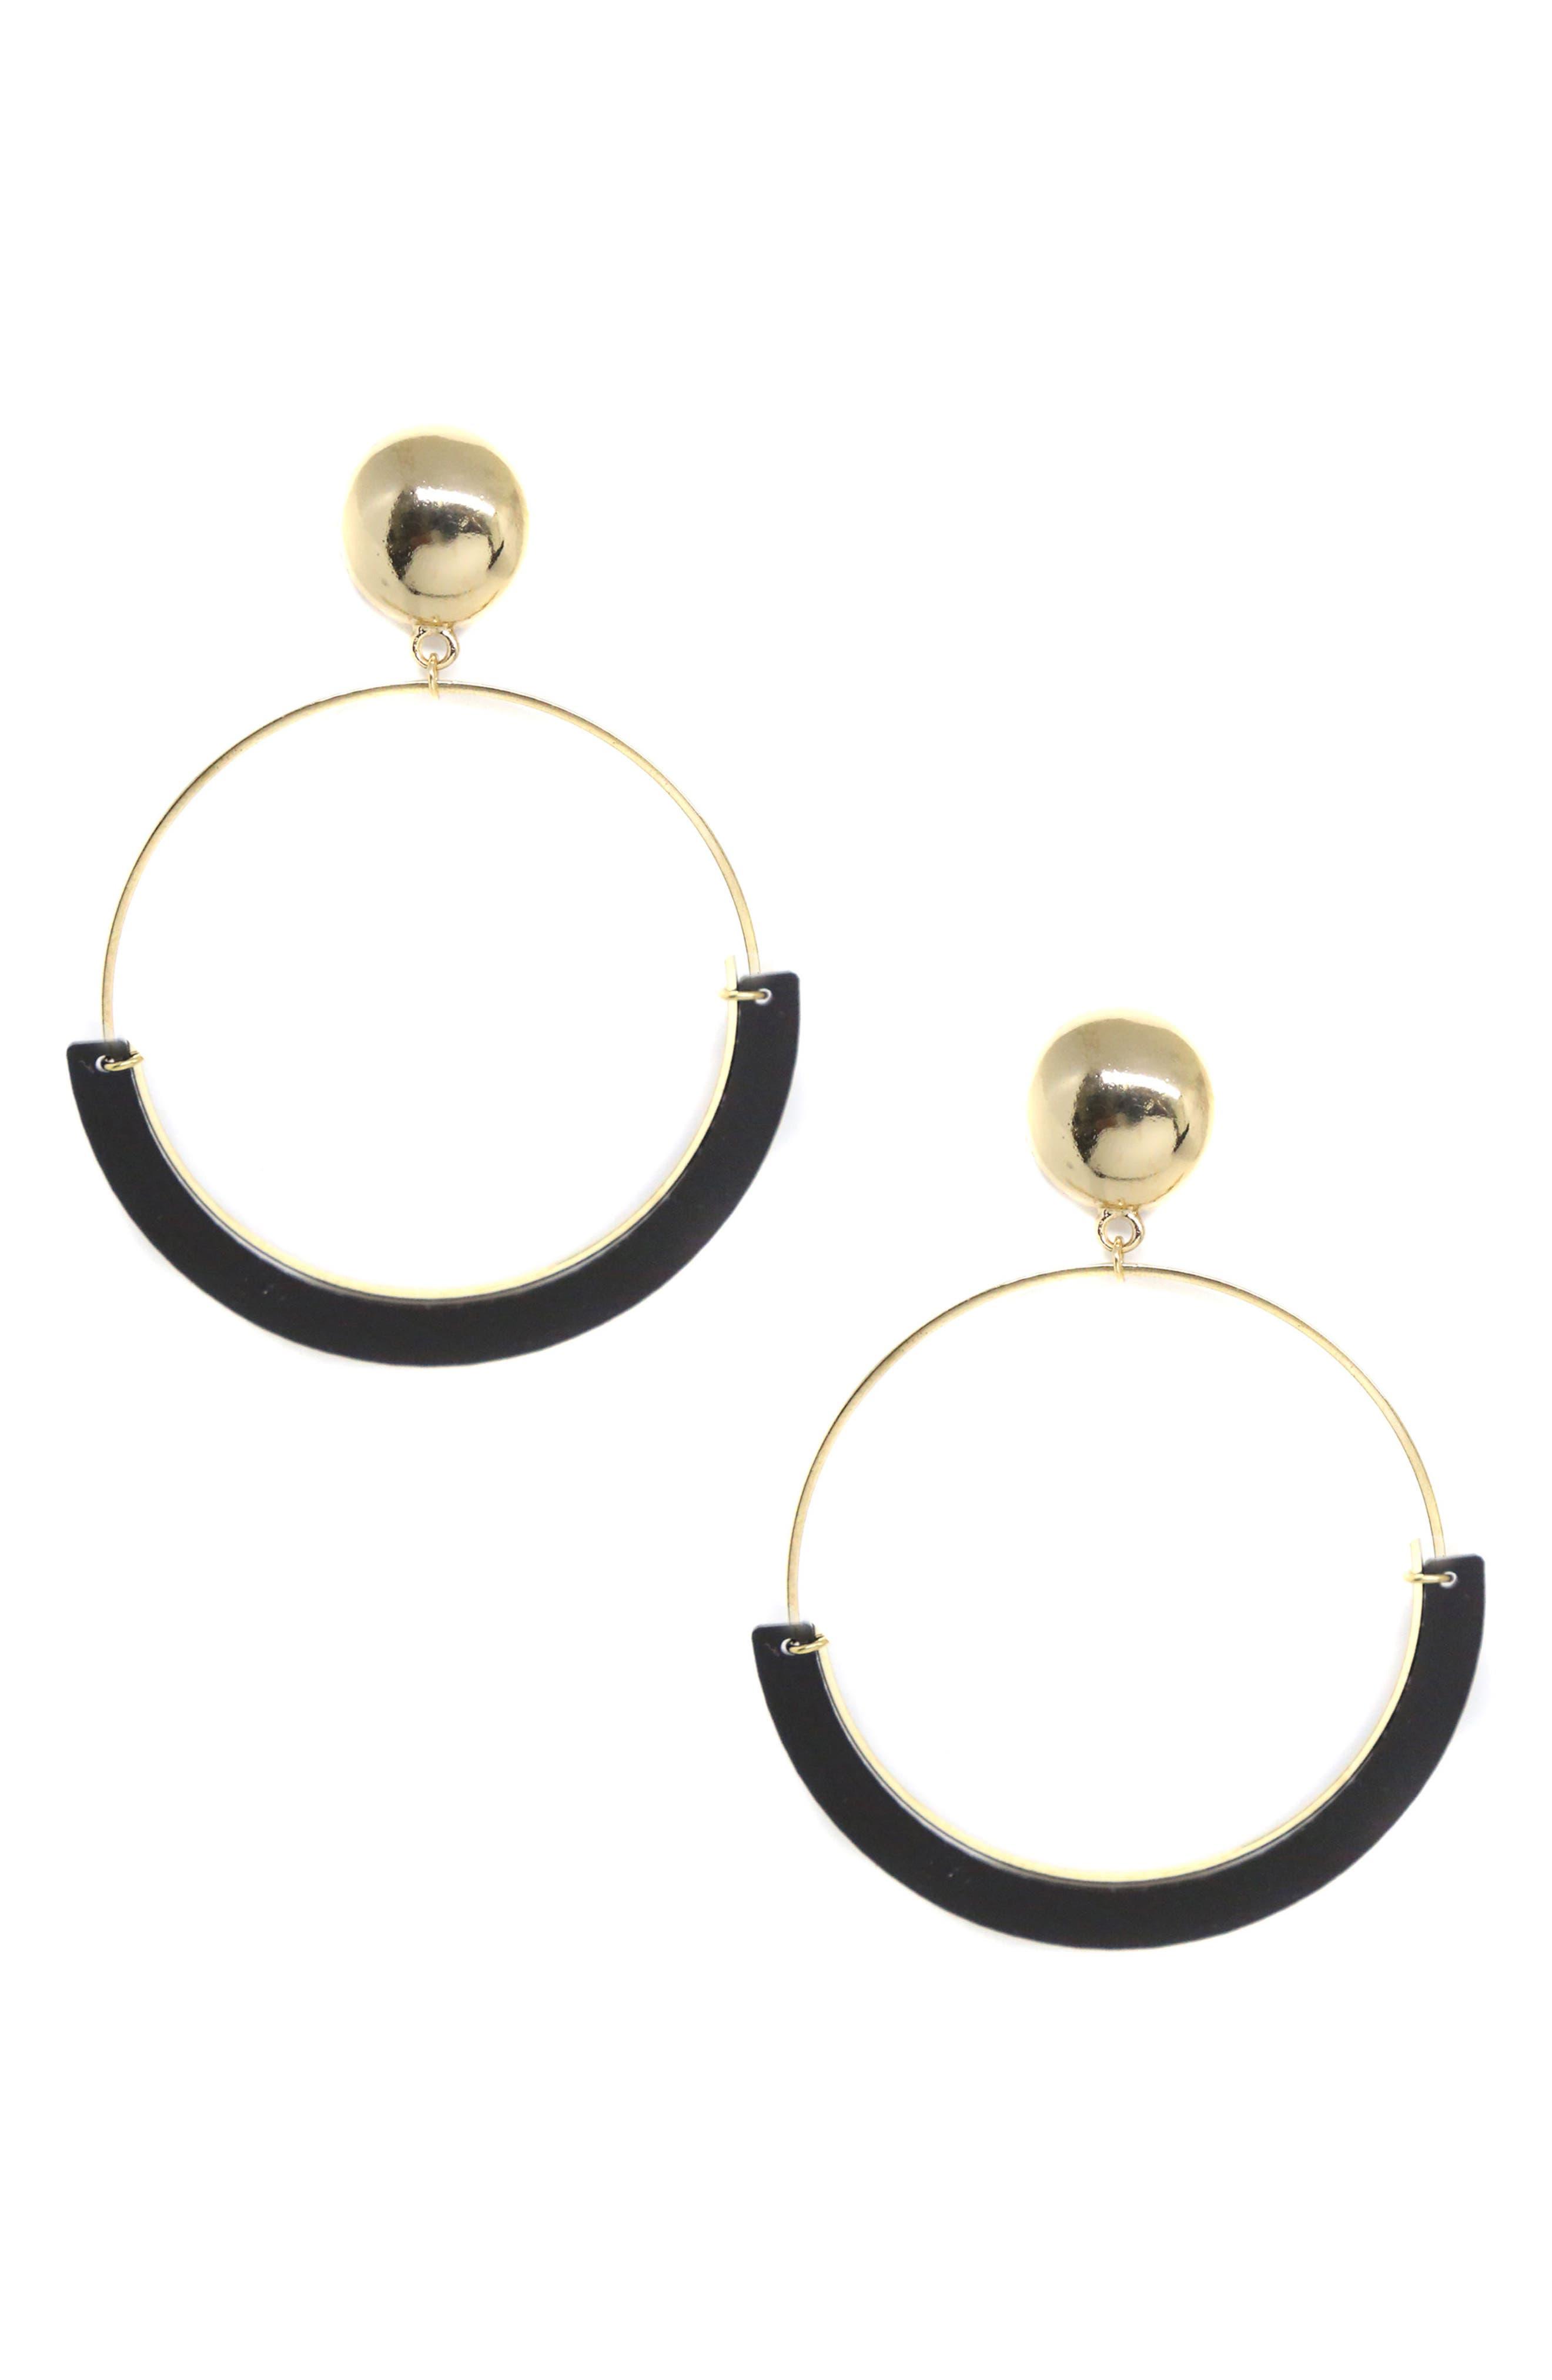 Gold Wire & Resin Hoop Earrings,                             Main thumbnail 1, color,                             Black